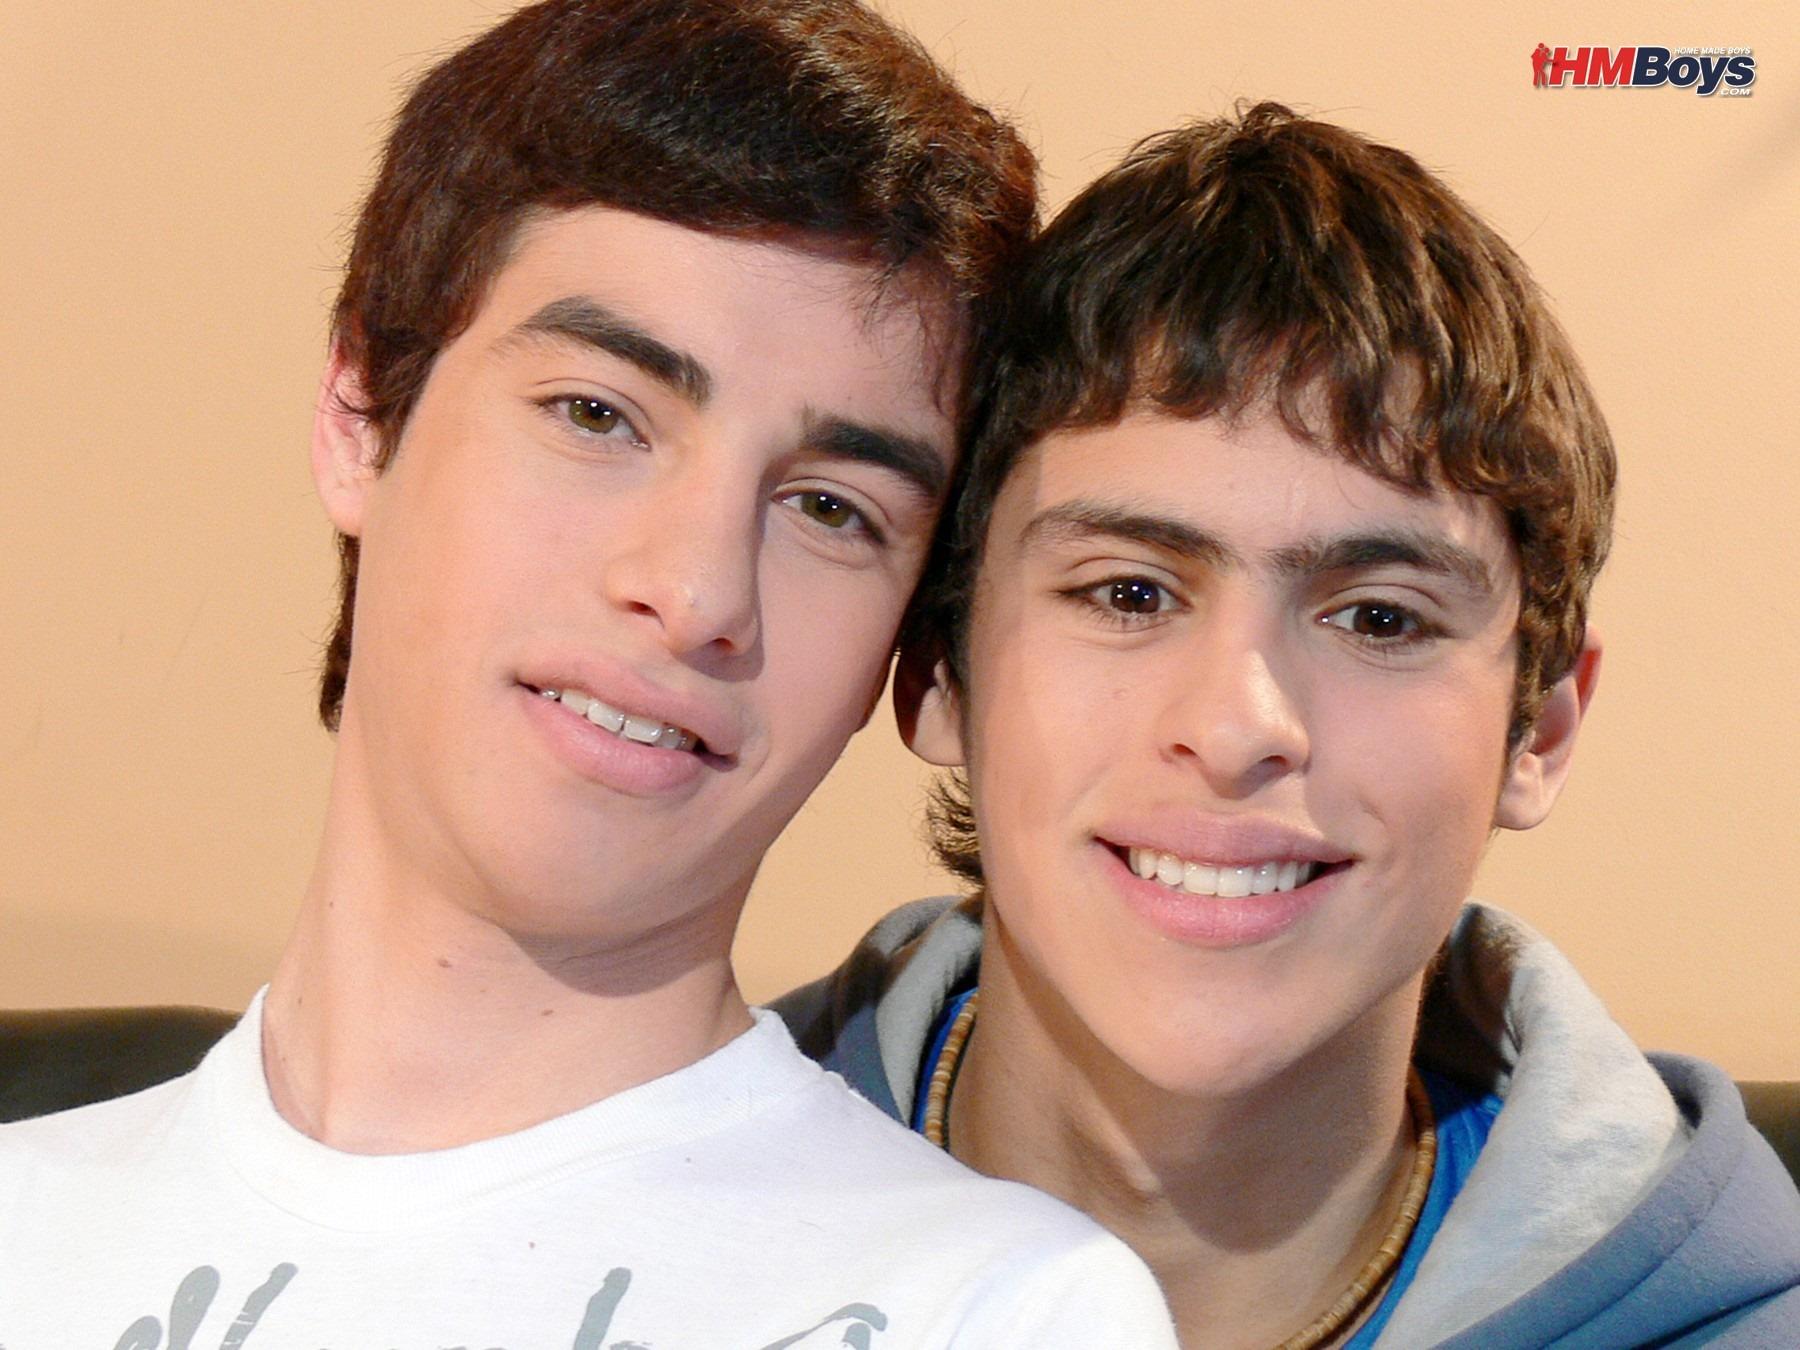 Free gay videos adrian and julian gay kissing